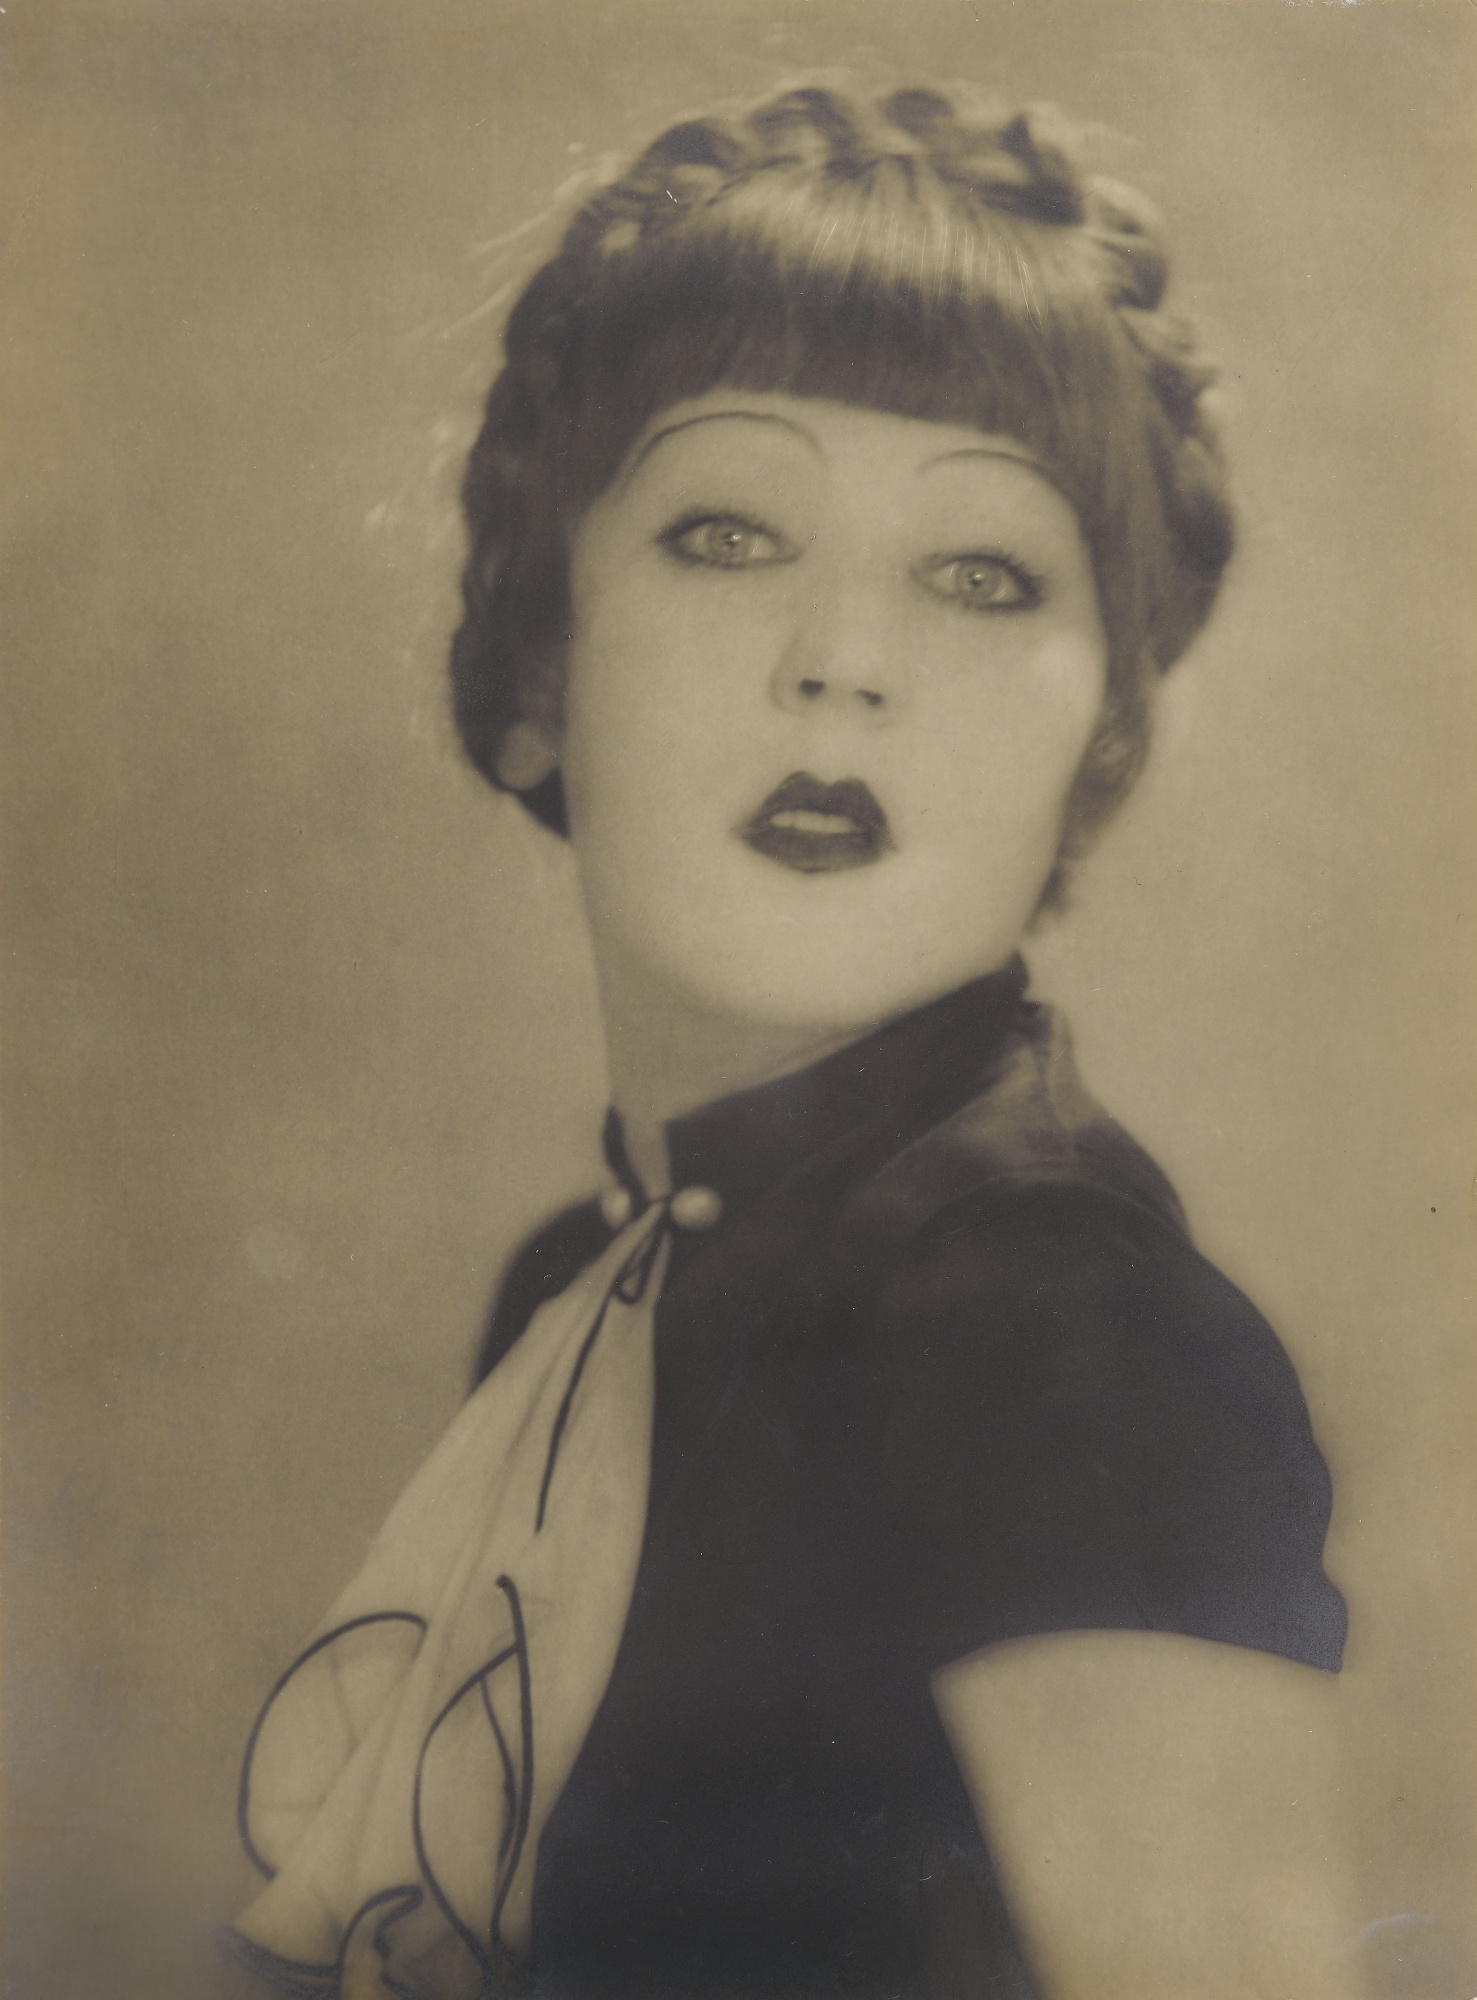 Man Ray-Catherine Hessling-1925